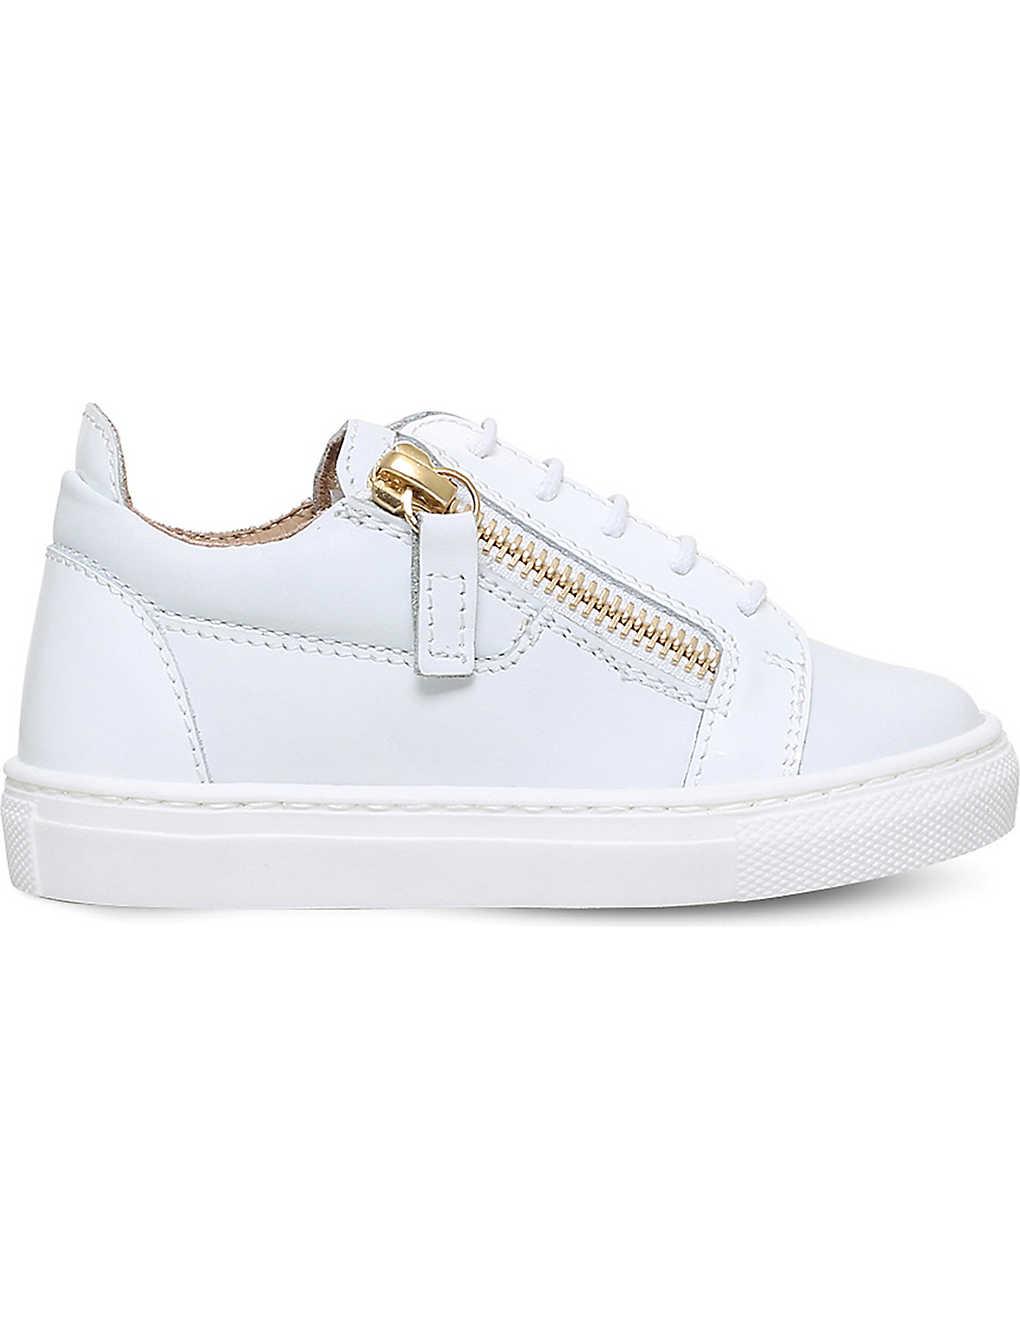 95d8fe35dbb4 GIUSEPPE ZANOTTI - Frankie junior leather sneakers